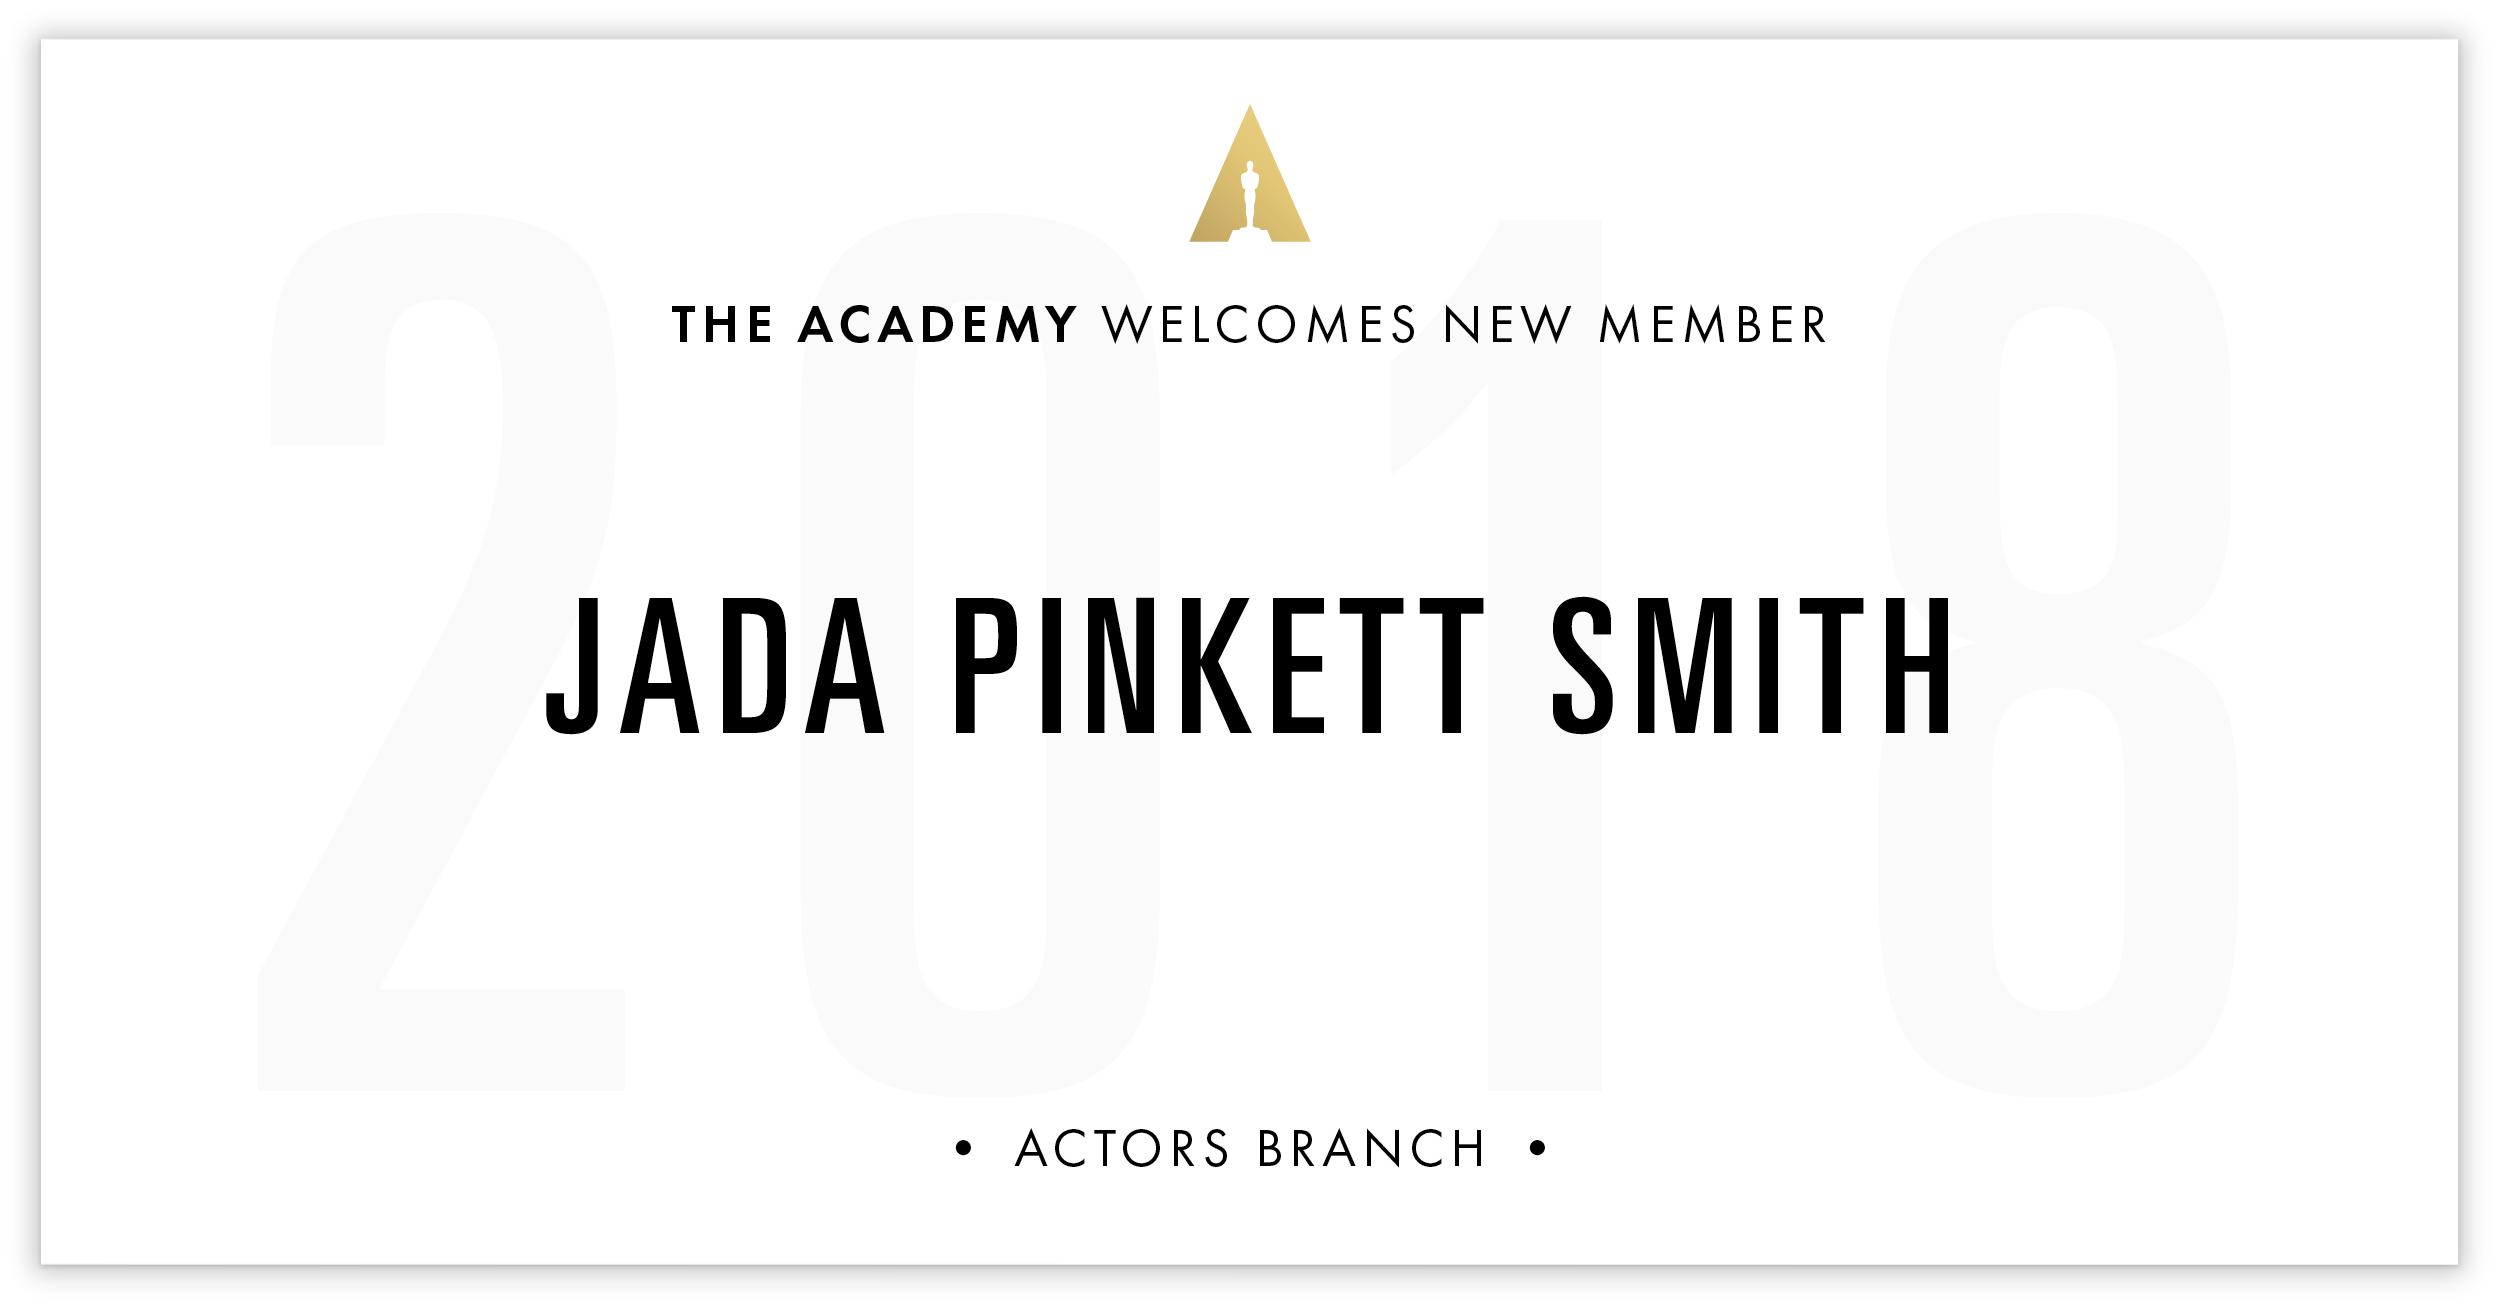 Jada Smith is invited!